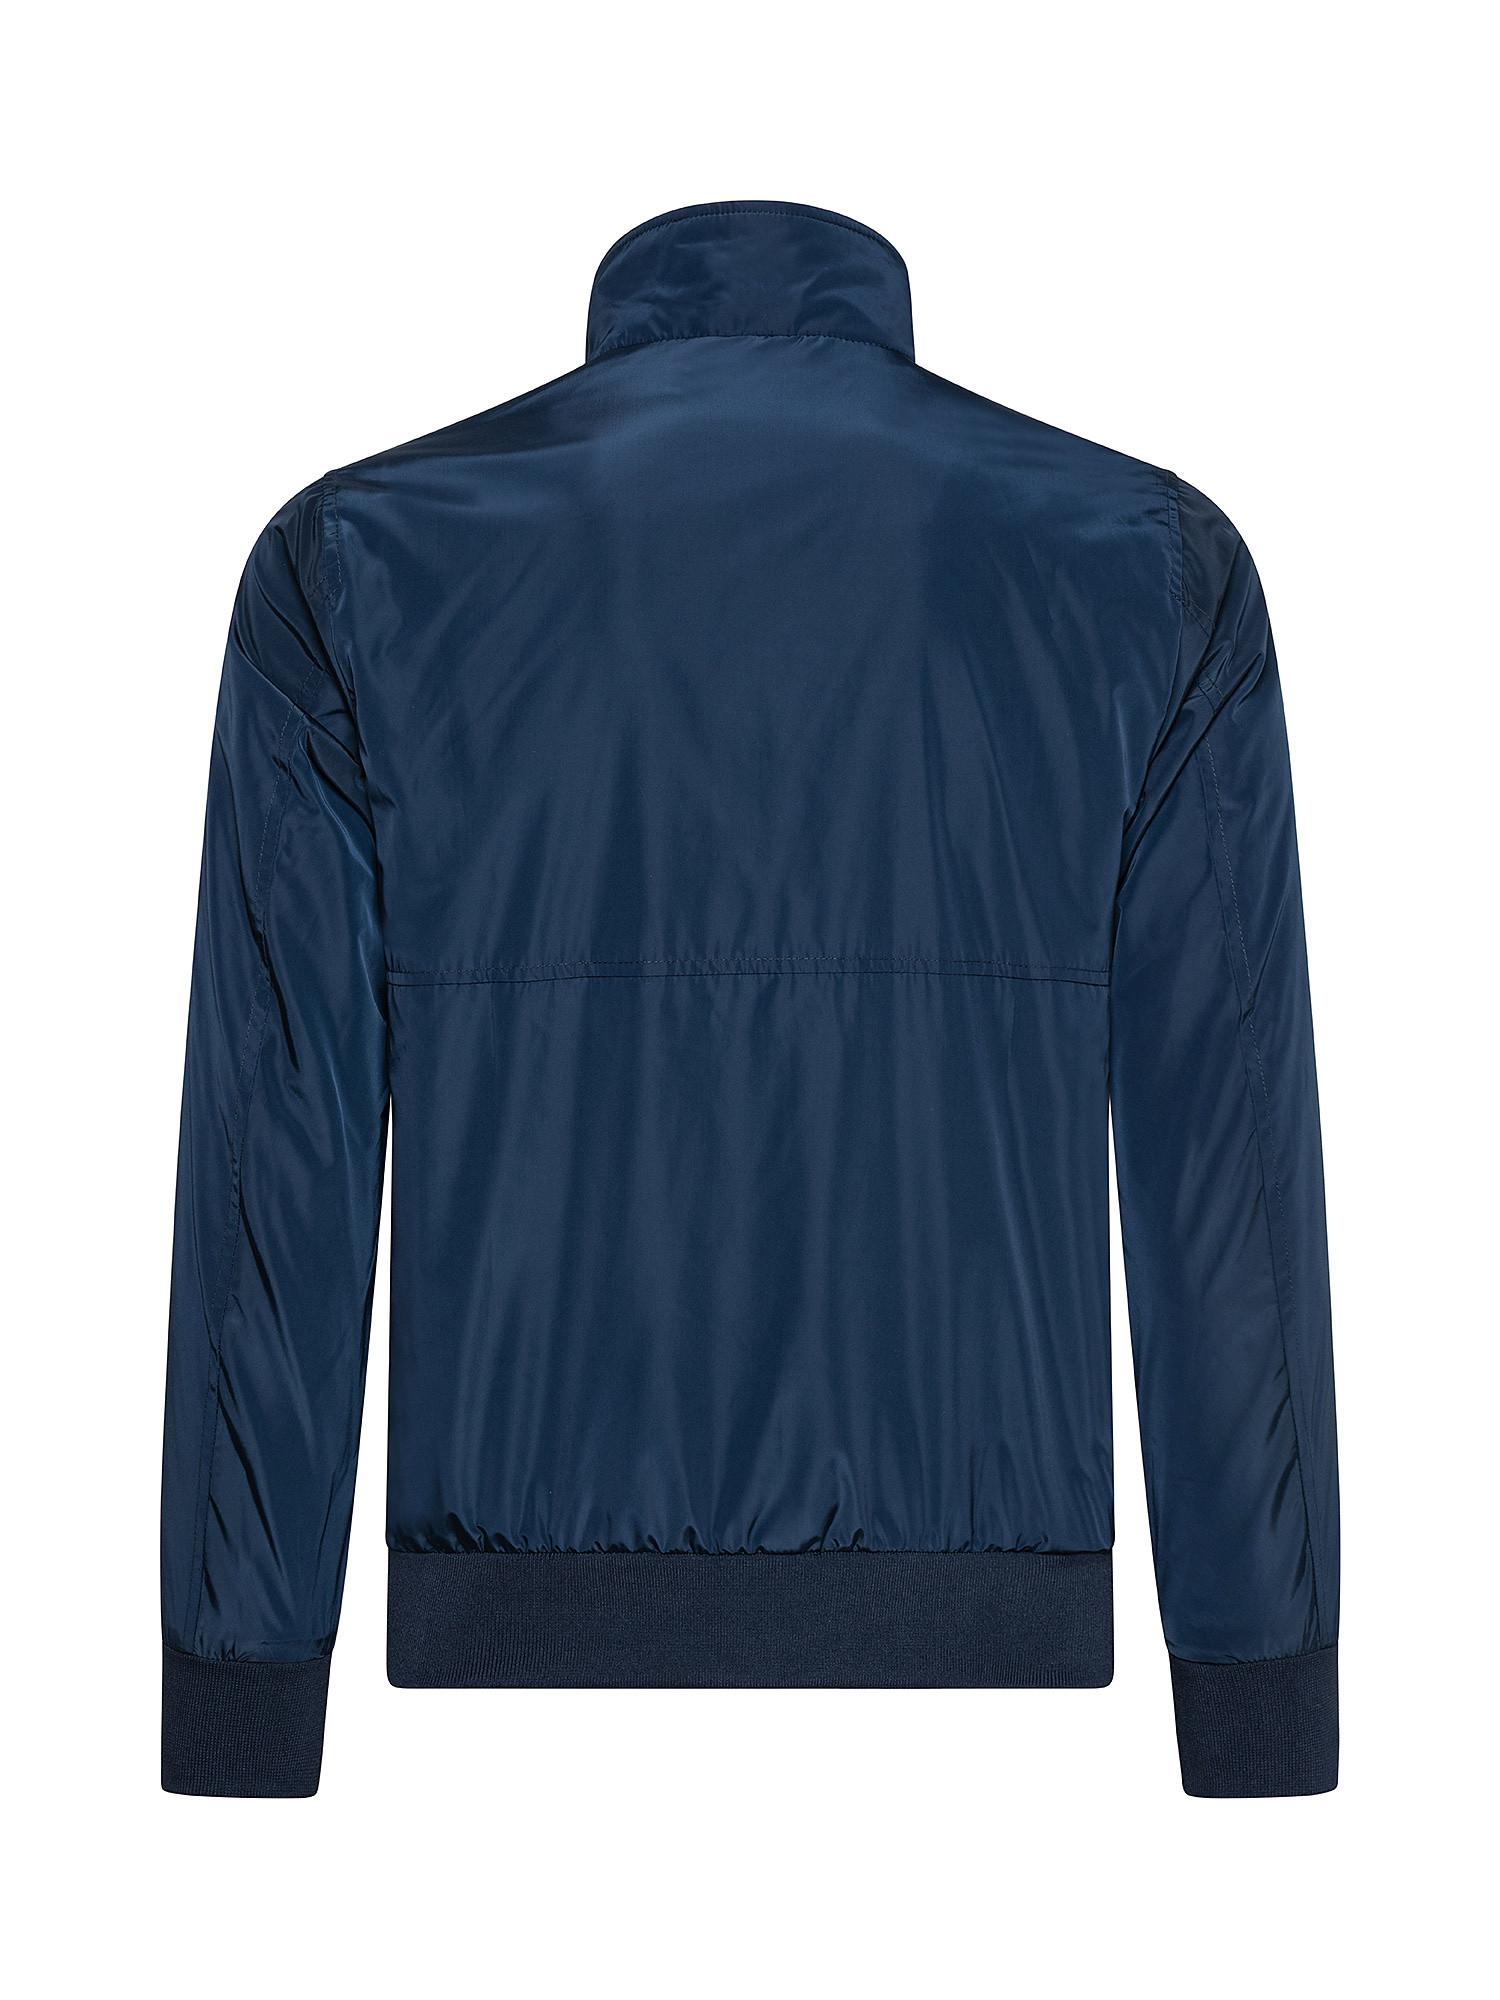 Giacca da uomo antivento regular fit, Blu, large image number 1